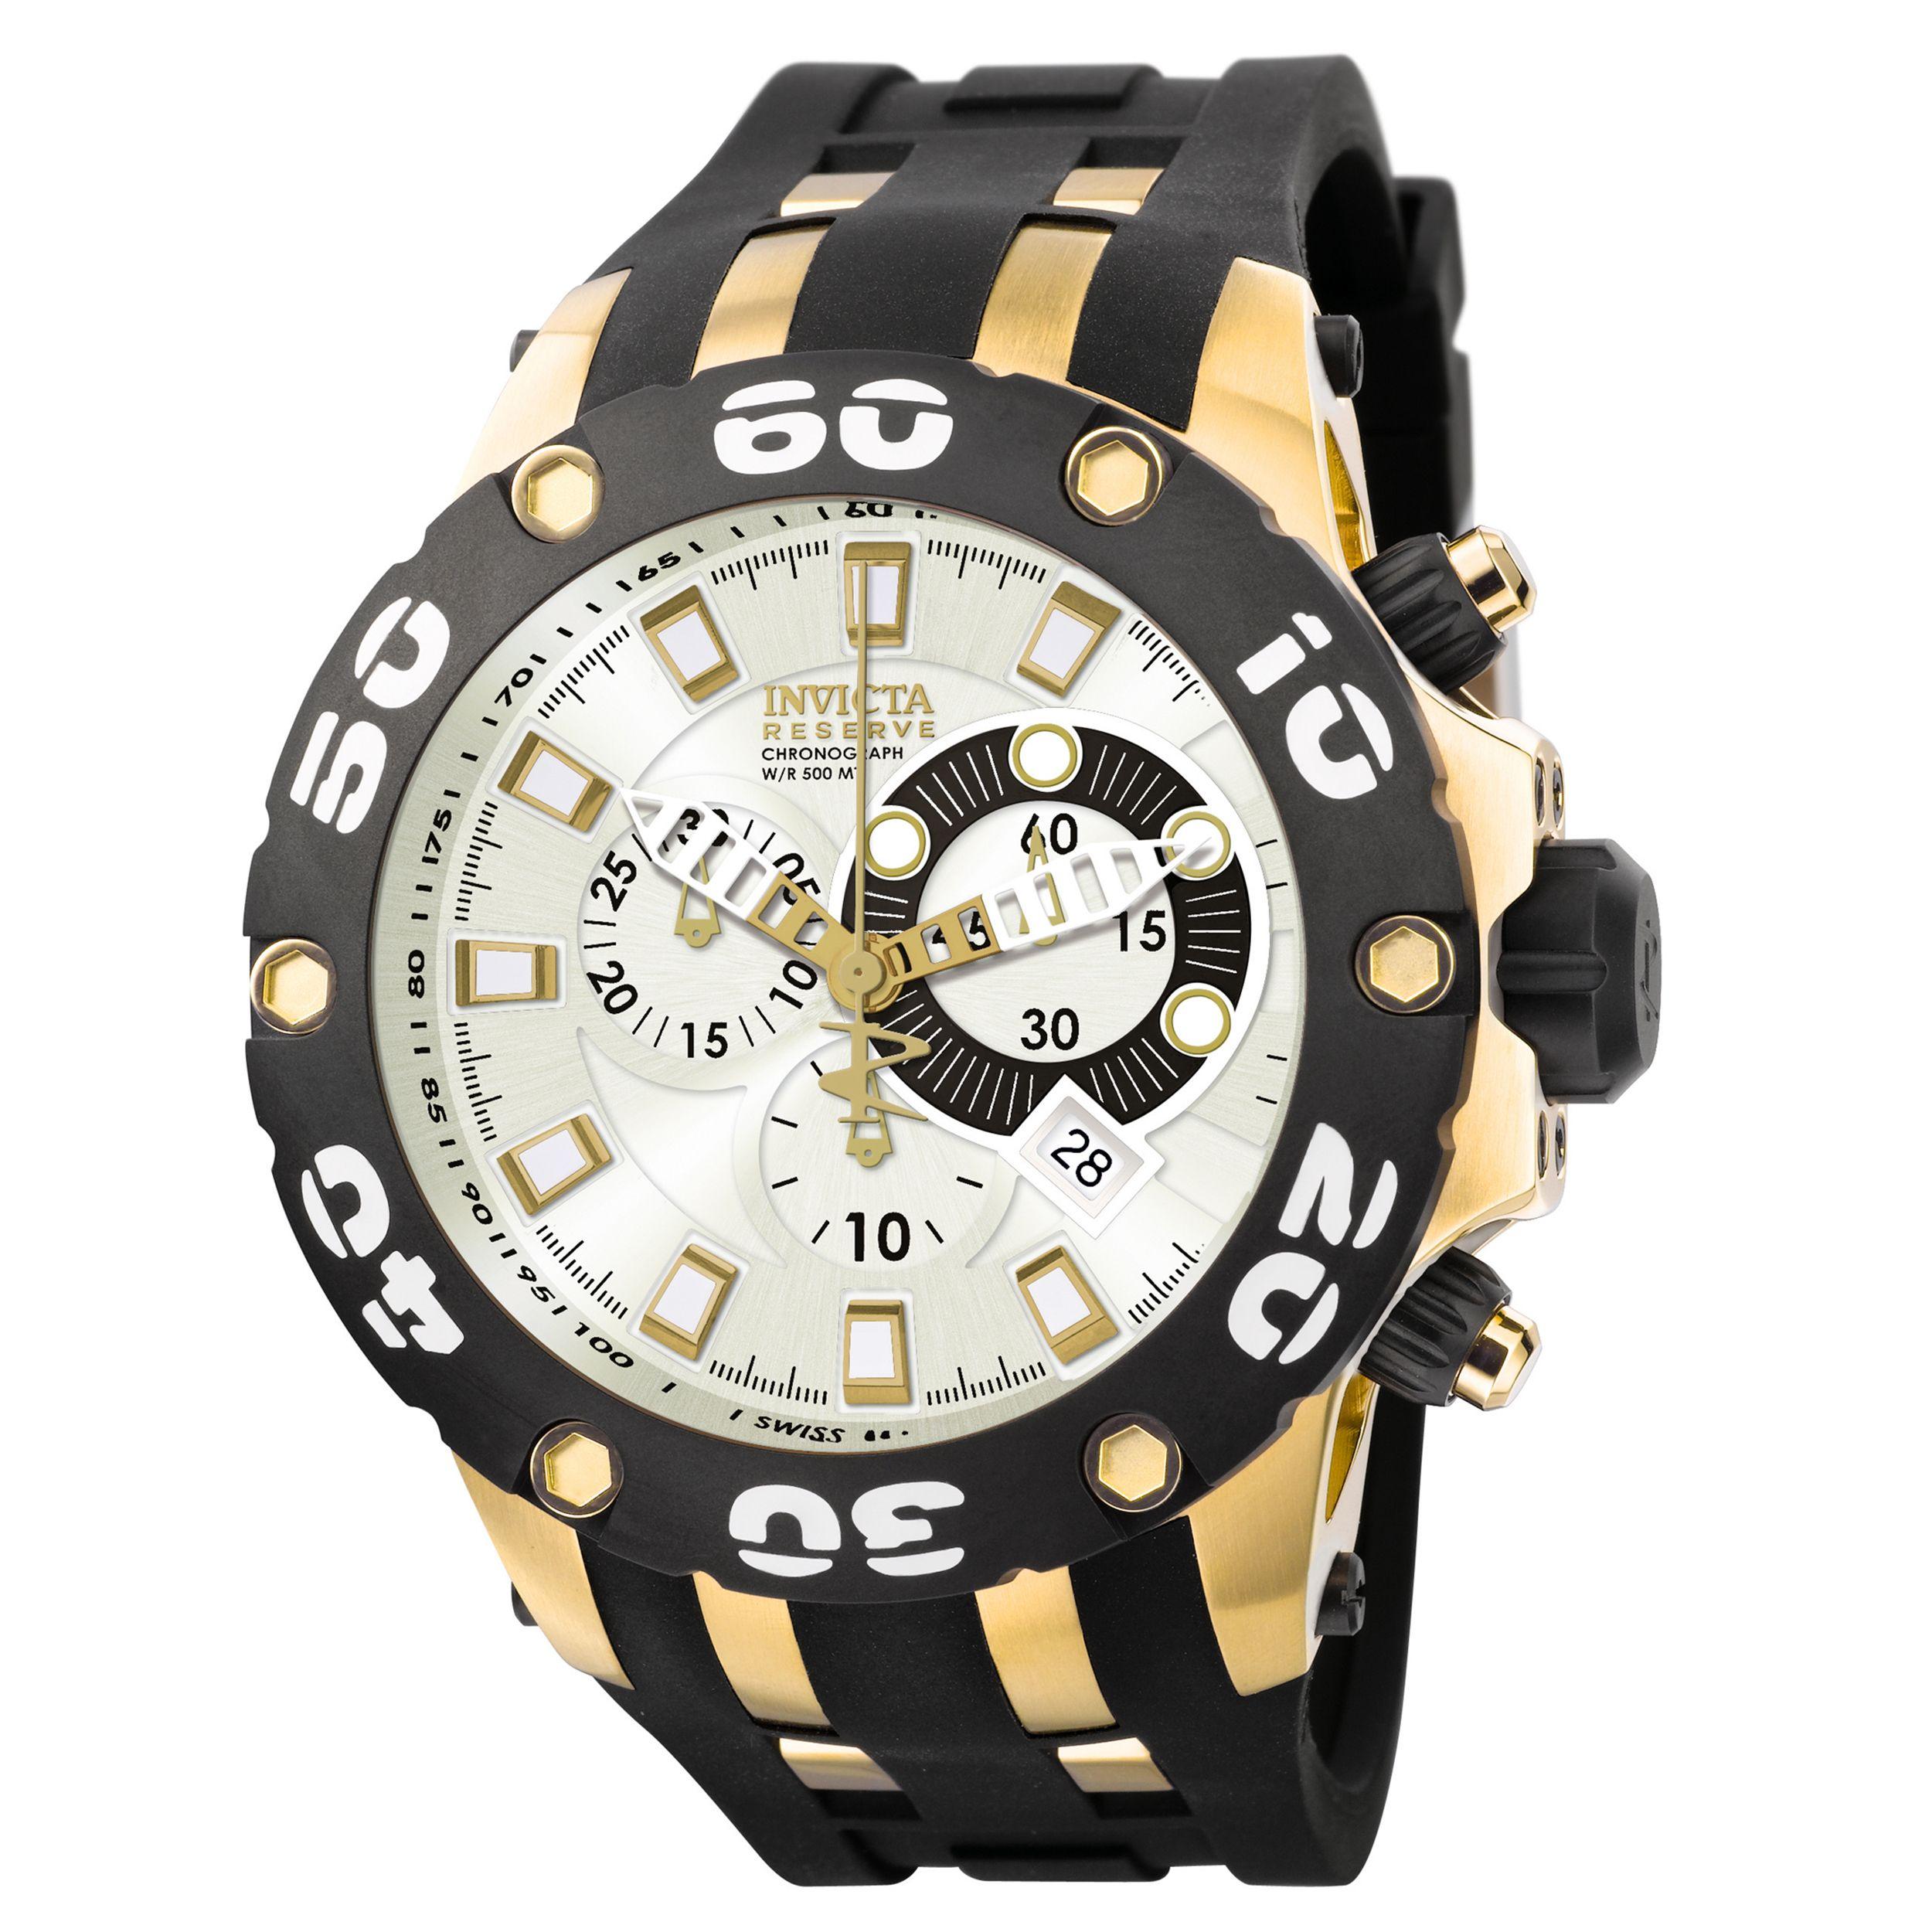 20af680307e Invicta Men s 0915 Subaqua Quartz Chronograph Dial Watch